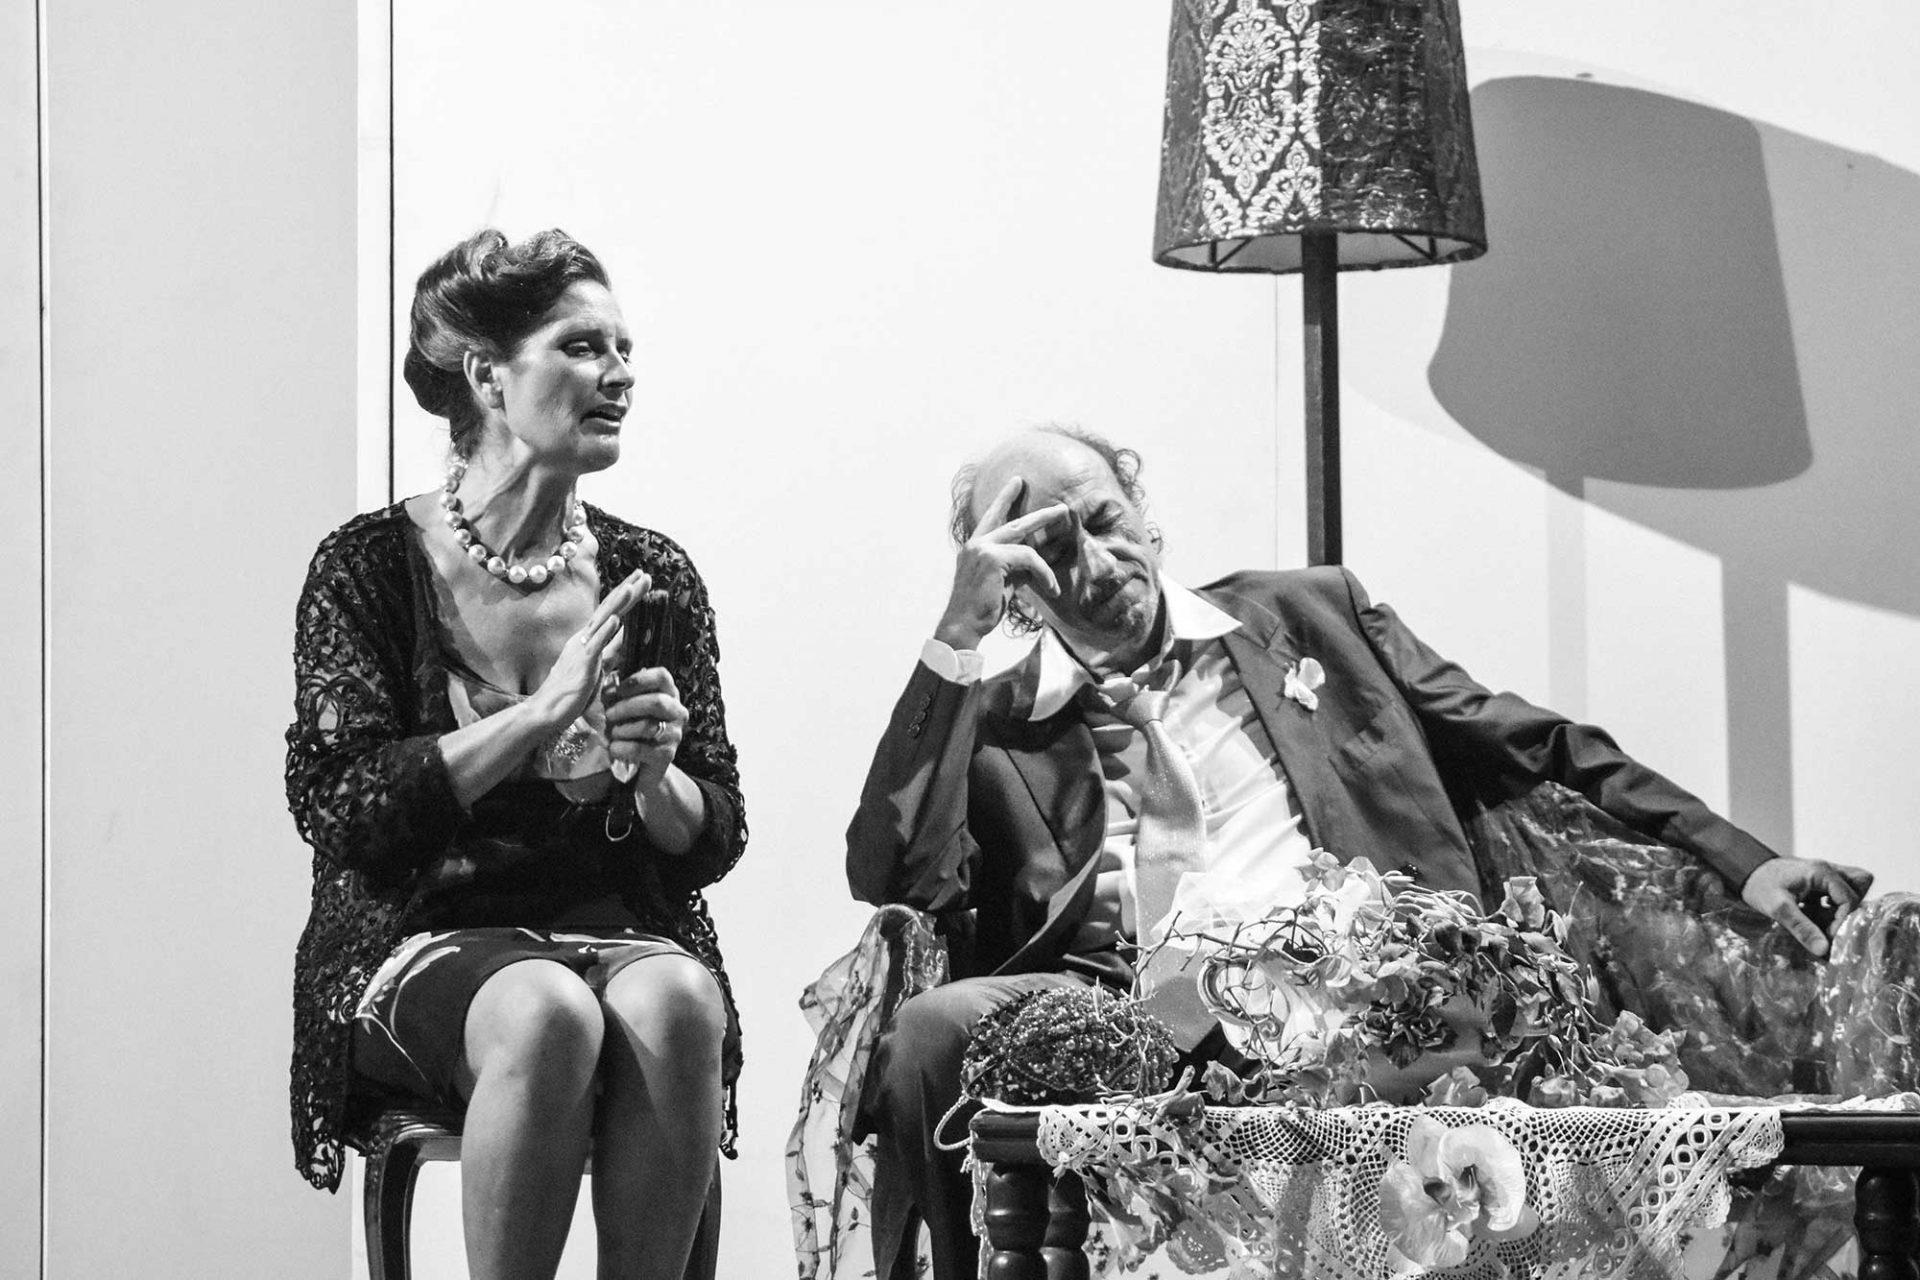 teatro-dialettale-lu-lette-gna-te-le-fie-marrucino-5